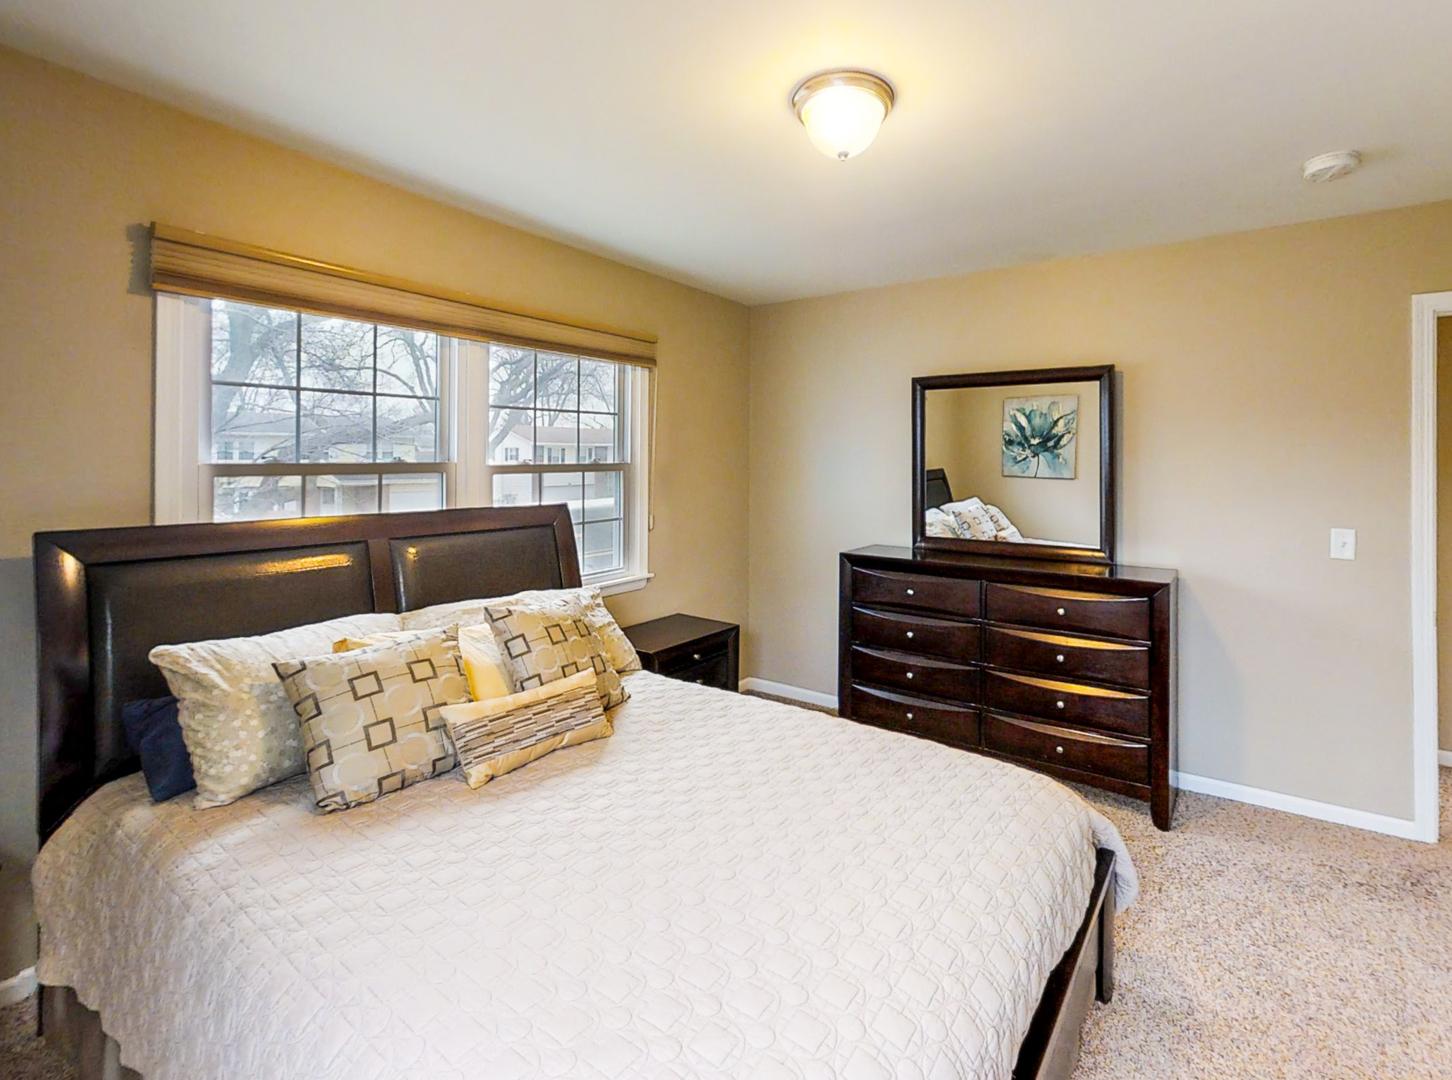 1414 South Cypress, Mount Prospect, Illinois, 60056